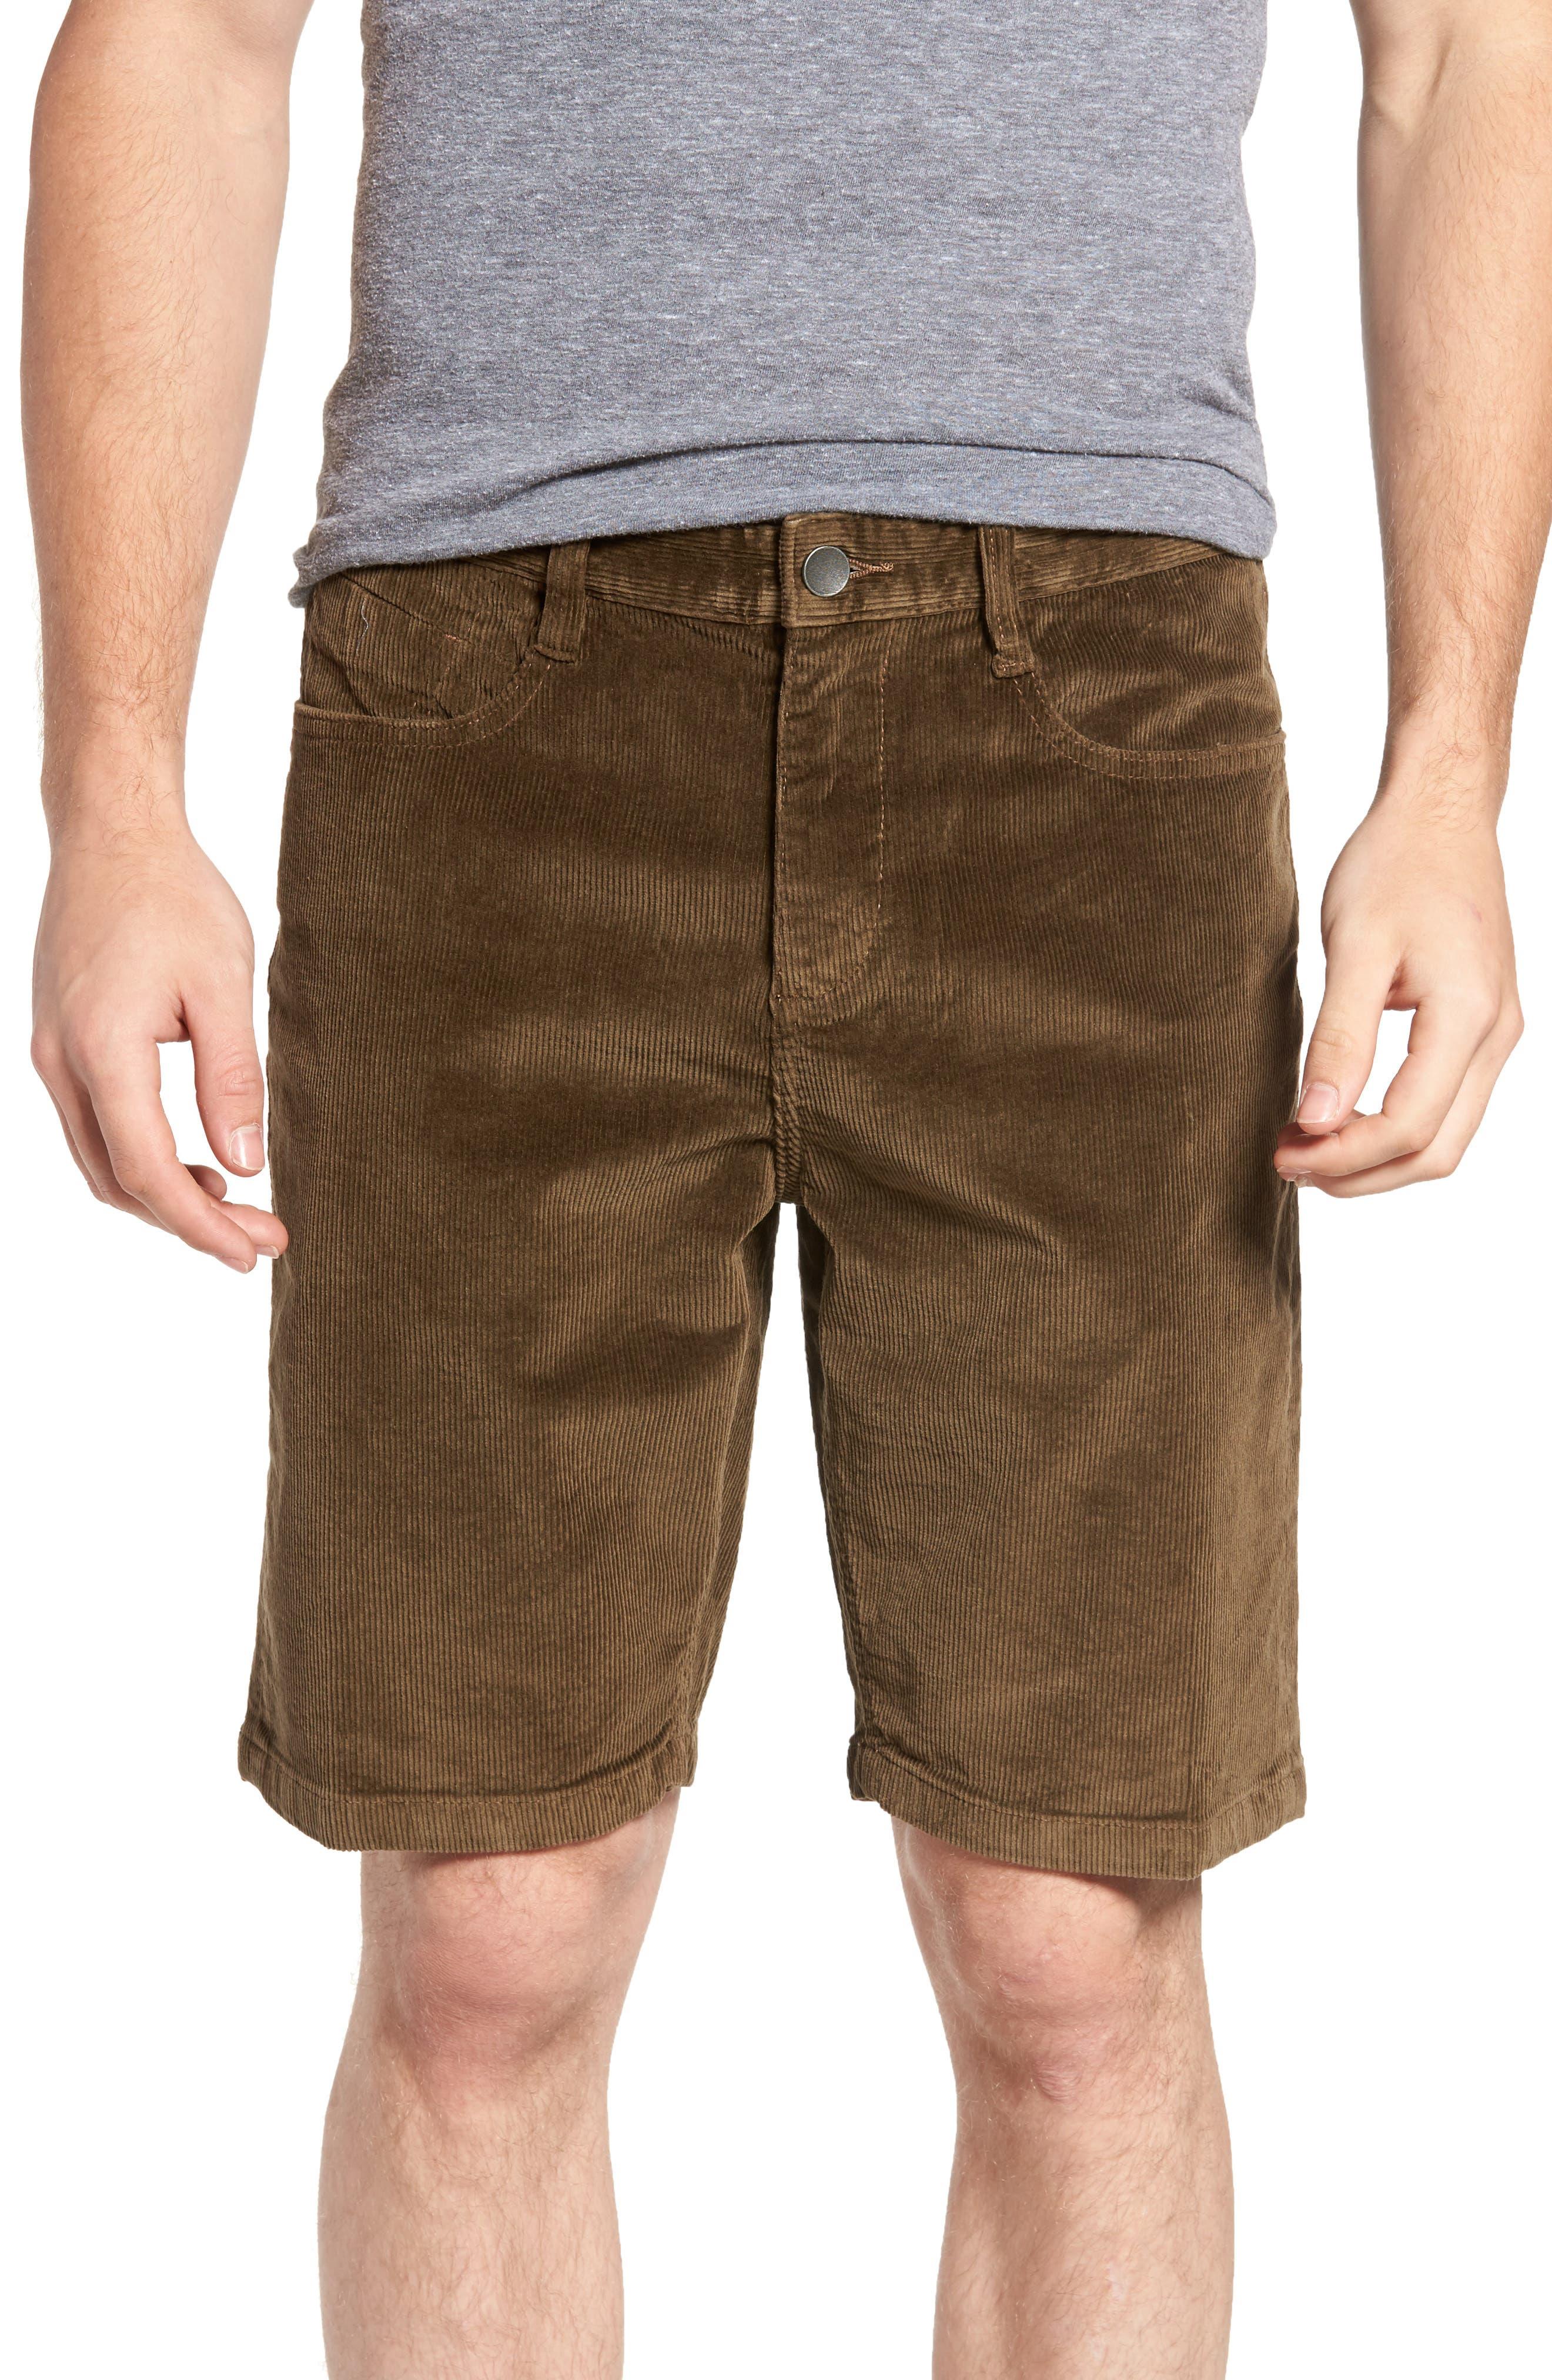 Alternate Image 1 Selected - Billabong Outsider Corduroy Shorts